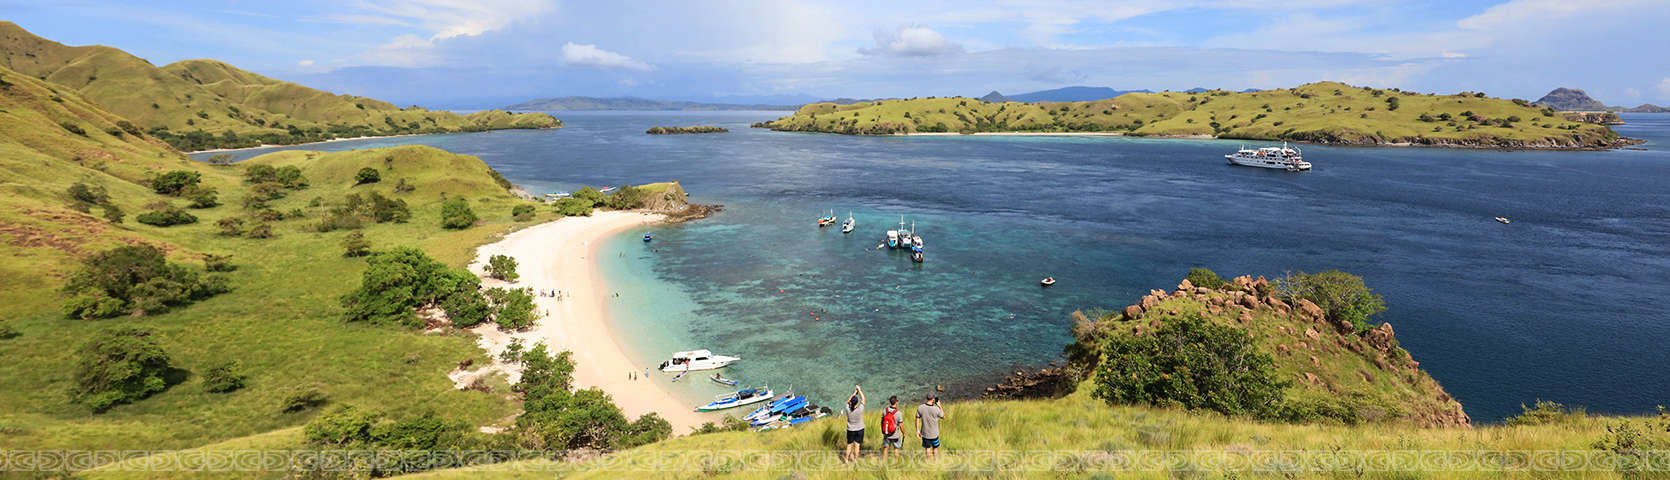 Komodo Dragons & Krakatoa Singapore to Darwin Coral Expeditions